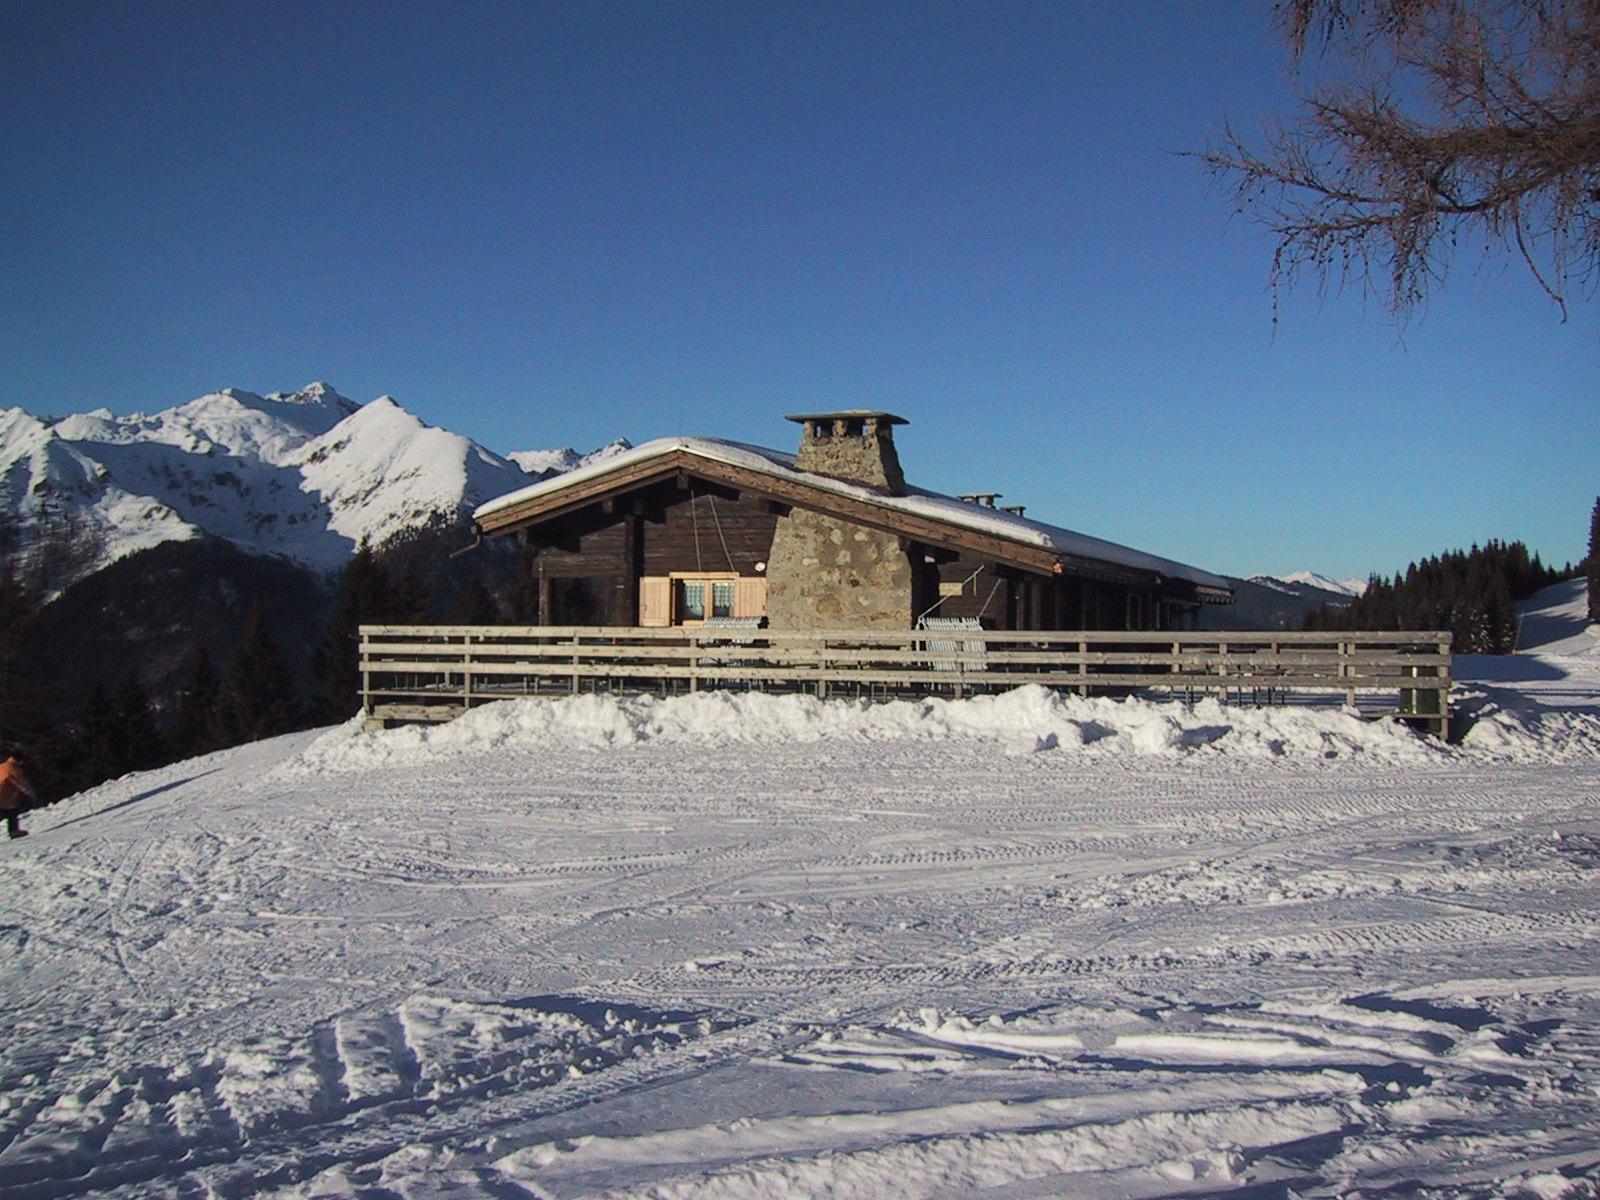 Malga Cioca Hut